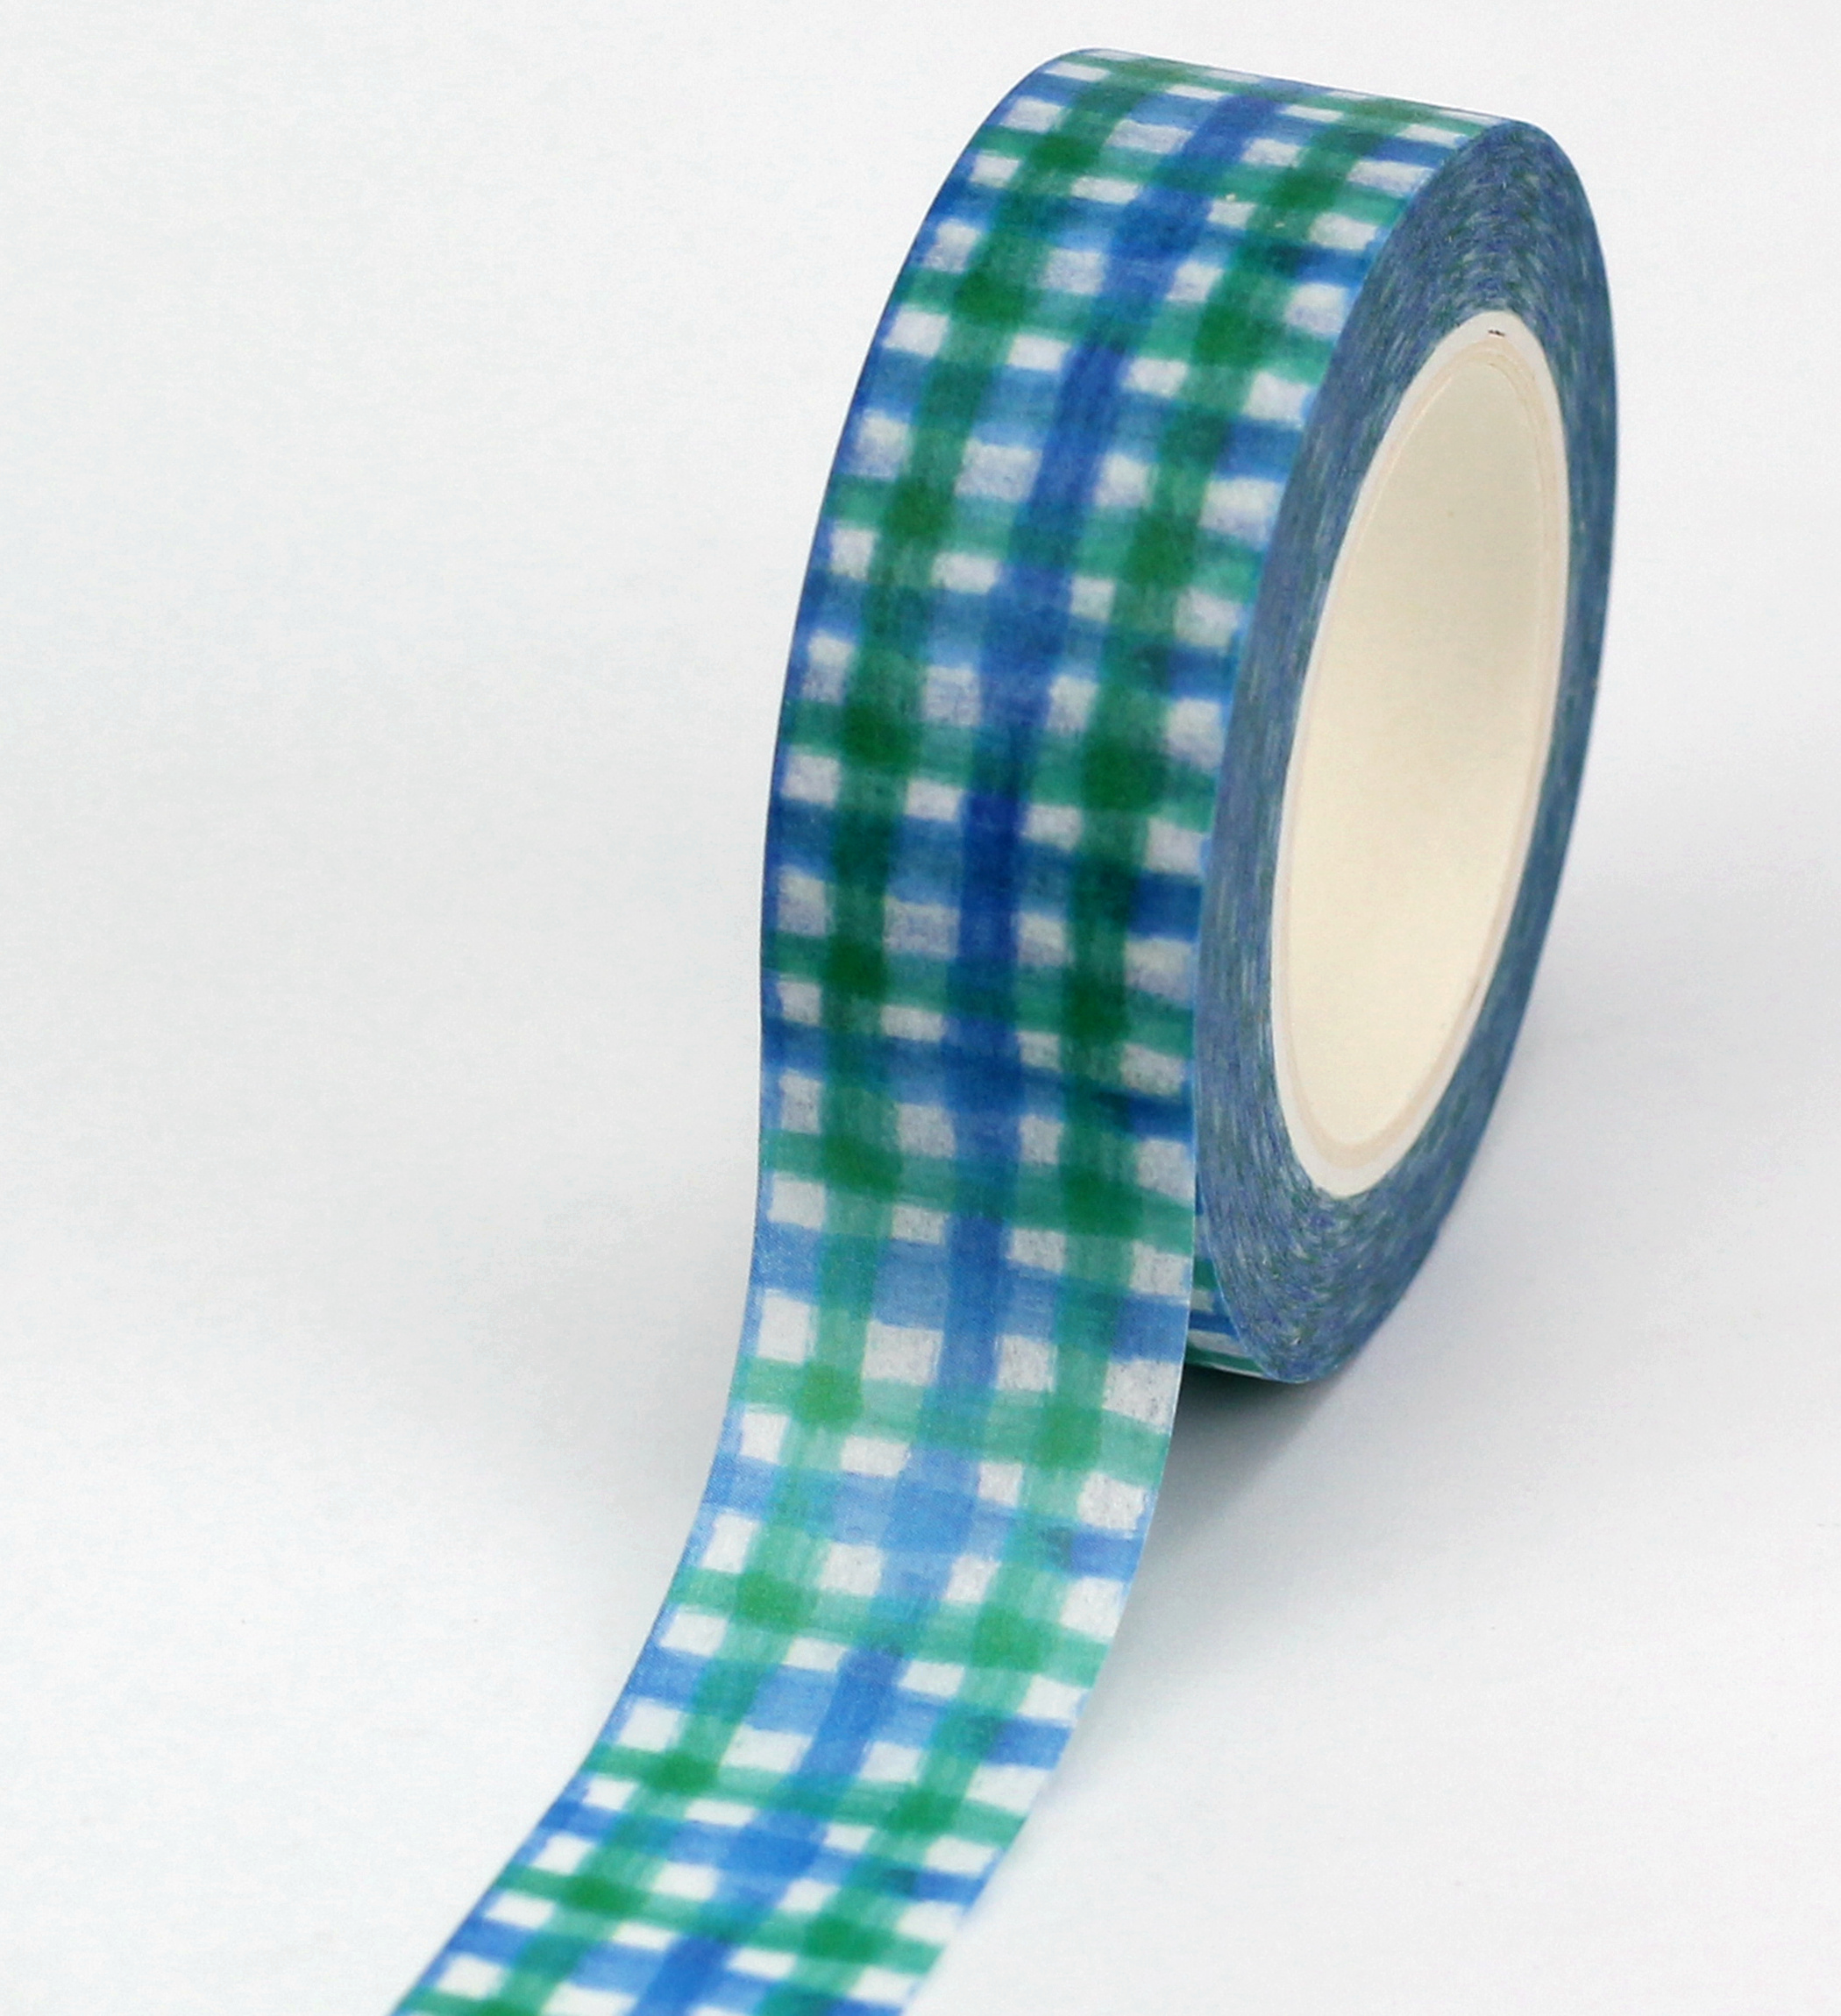 10pcs/lot Decorative Cute Blue Green Plaid Washi Tapes Paper DIY Scrapbooking Planner Adhesive Masking Tapes Kawaii Stationery